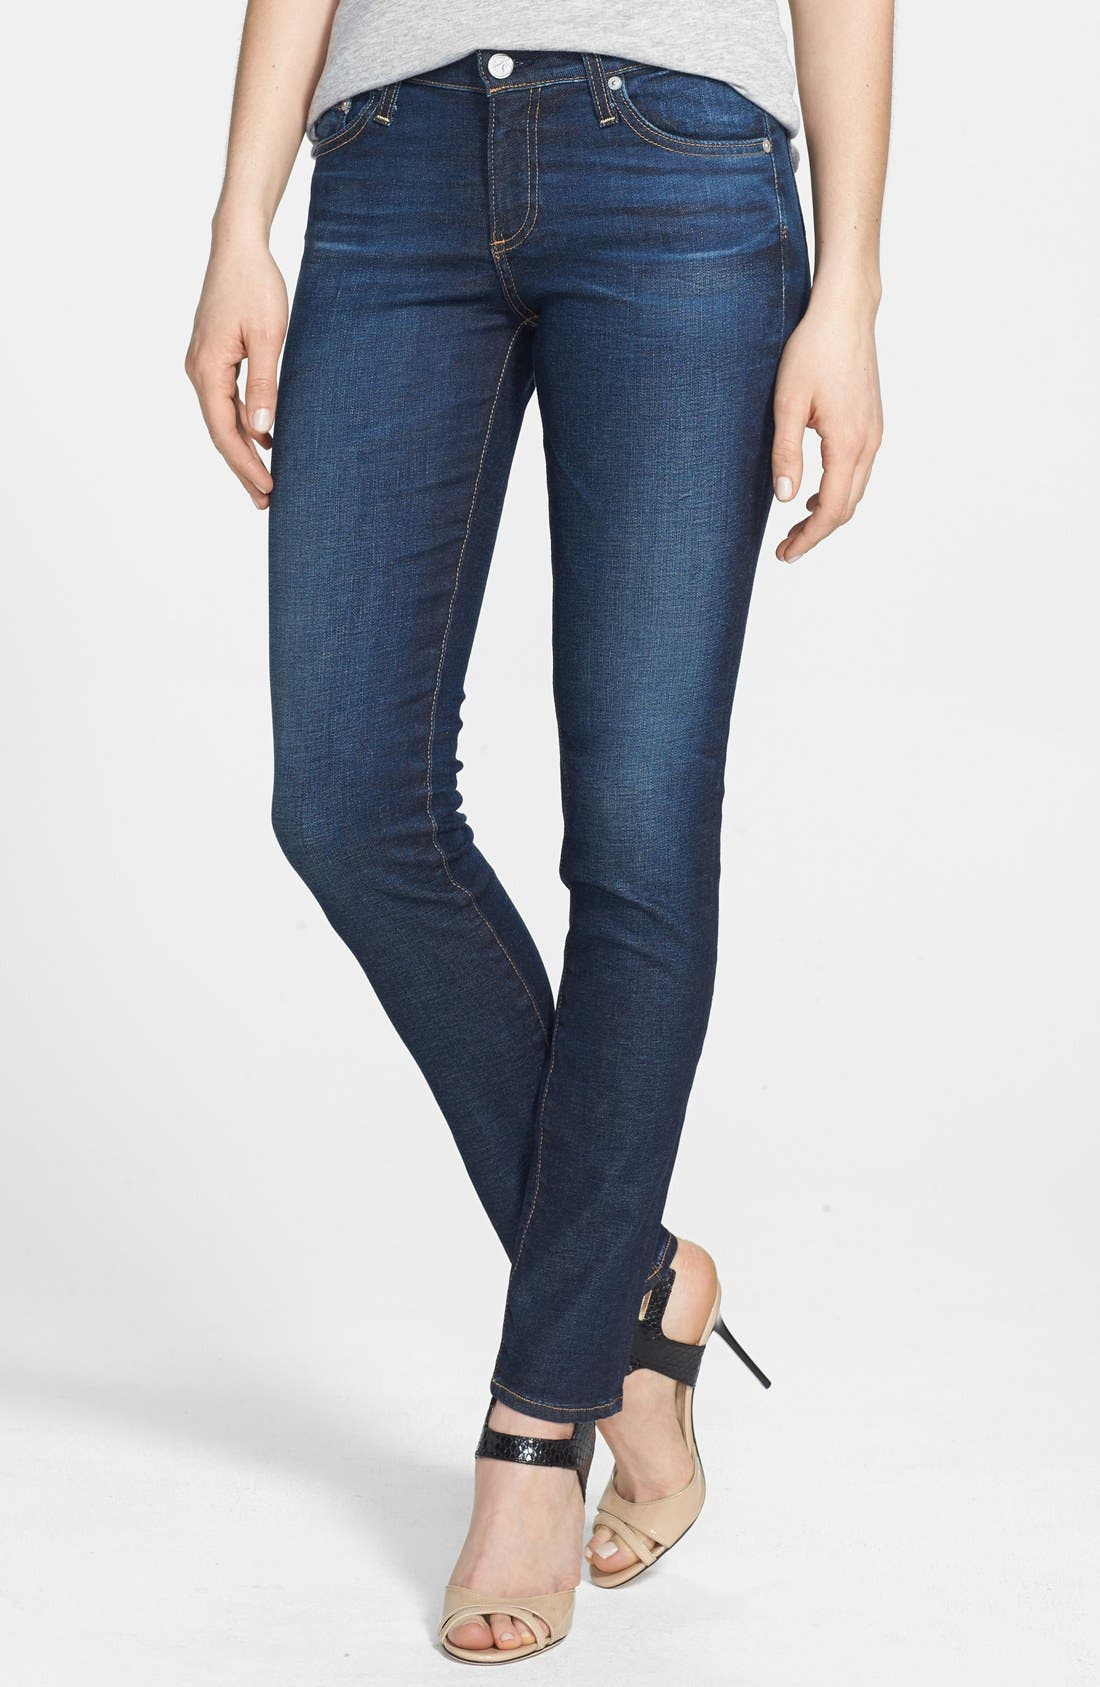 Main Image - AG 'The Stilt' Cigarette Leg Jeans (Three Year Propell)